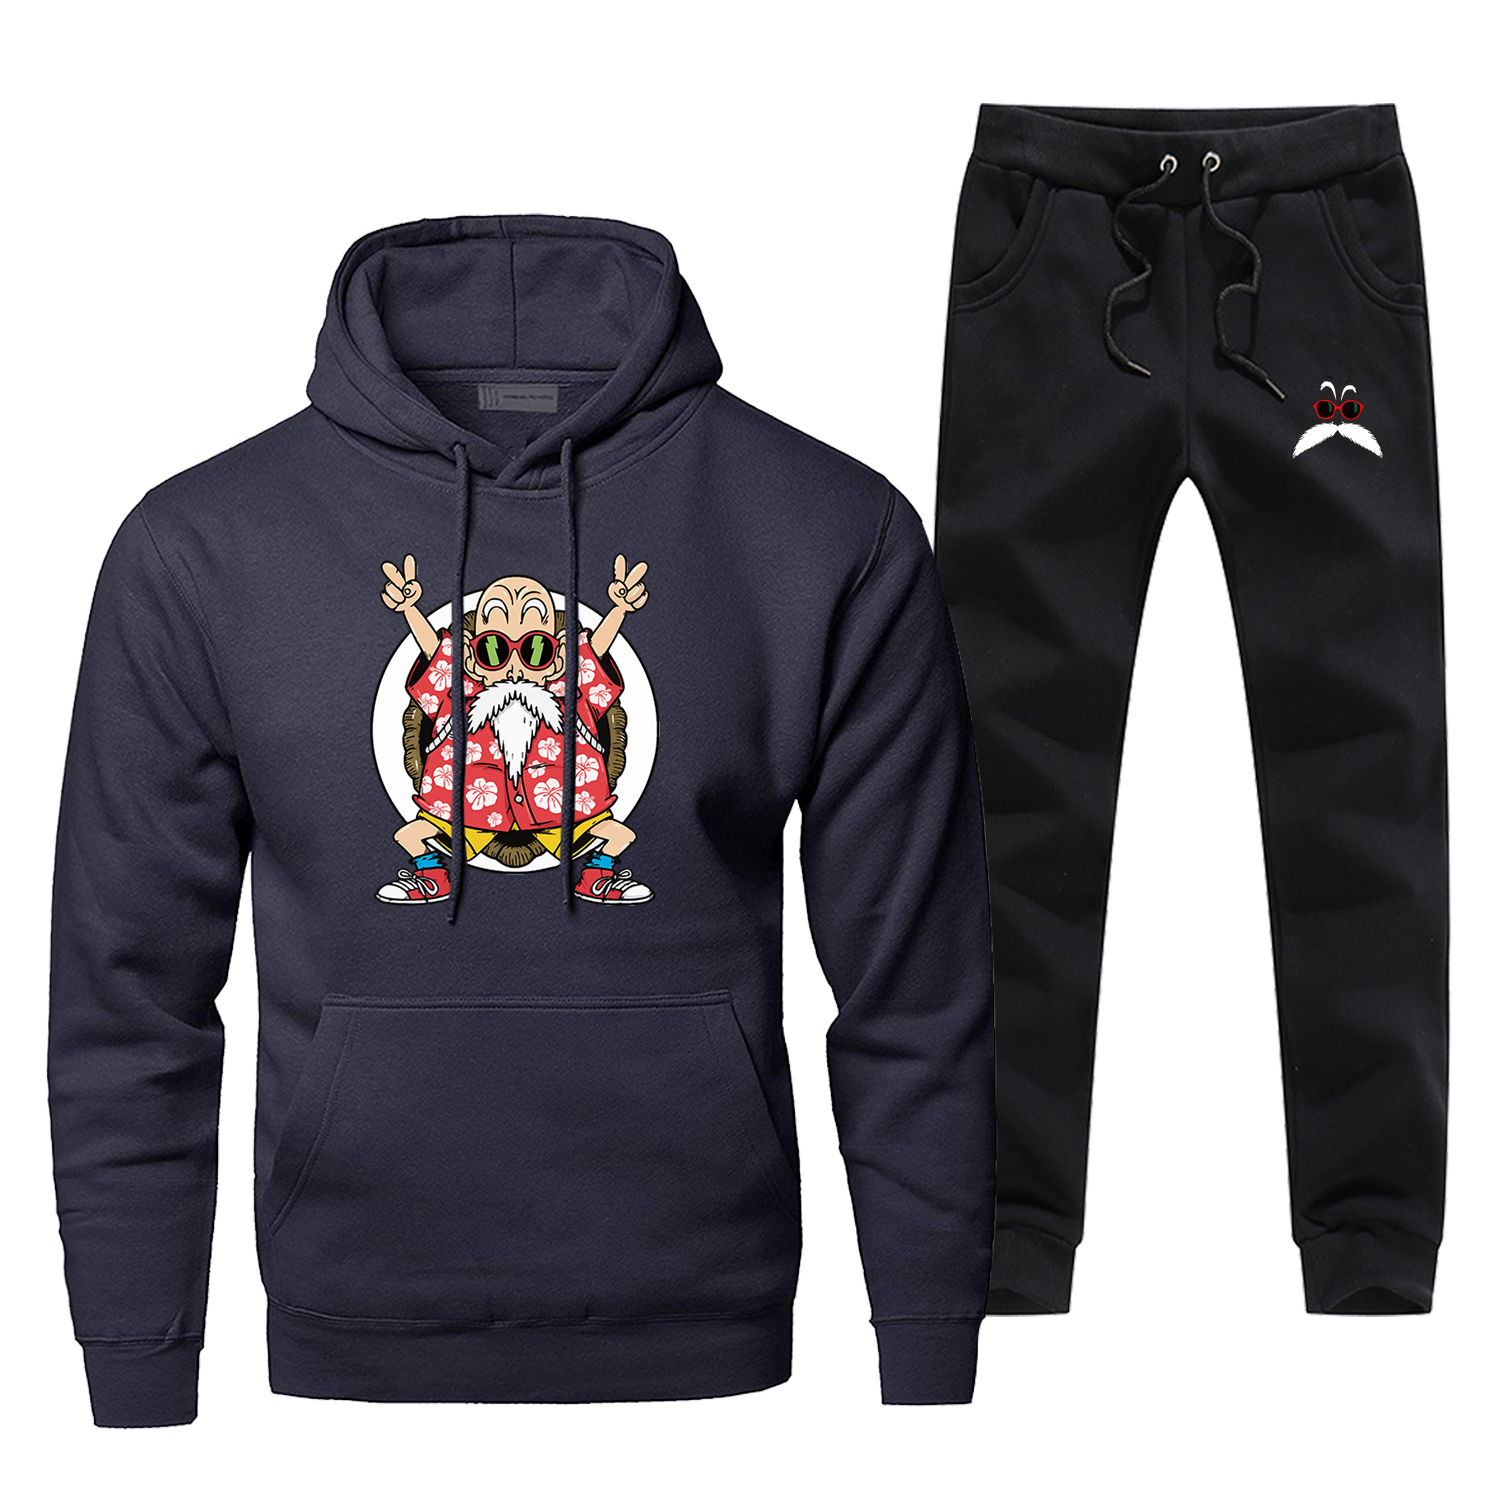 Japan Anime Dragon Ball Hoodies Sweatshirt Master Roshi Men's Full Suit Tracksuit Harajuku Sweatpants Streetwear Chandal Hombre